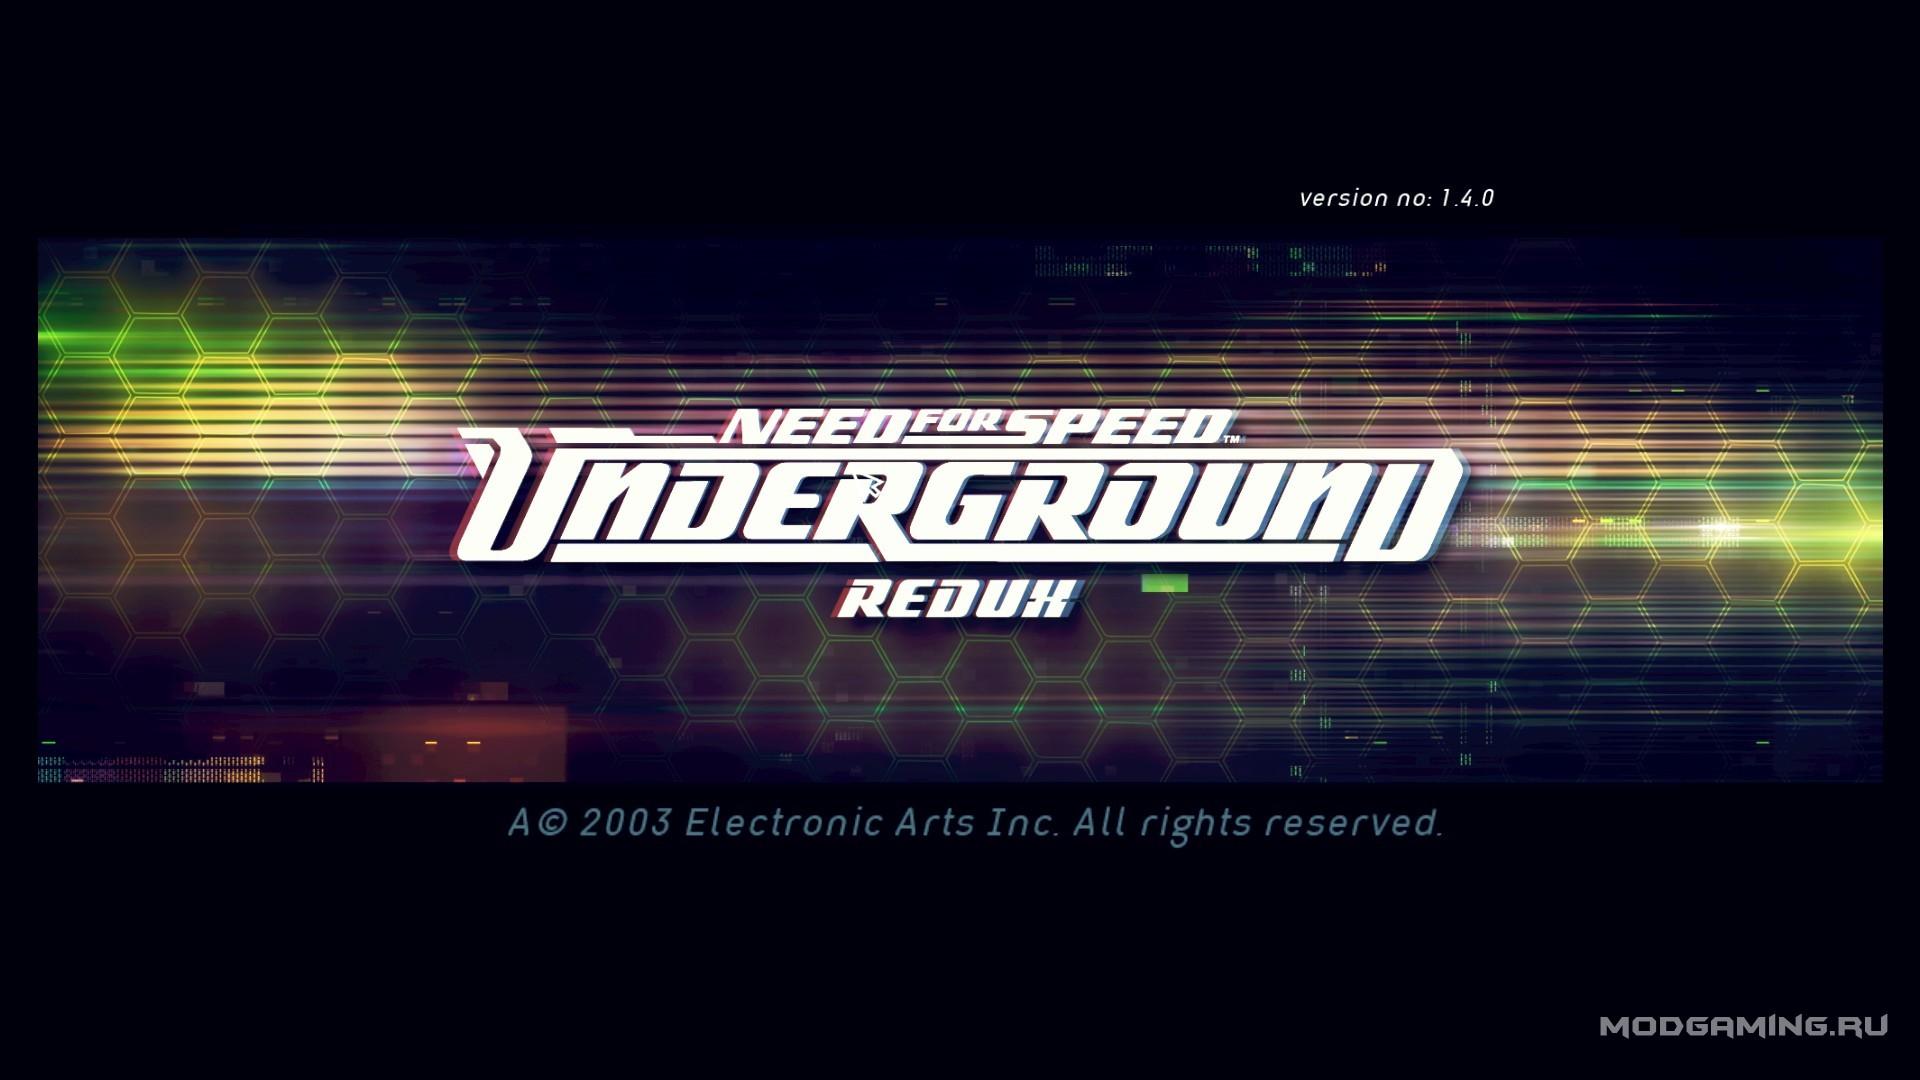 need for speed underground 2 redux